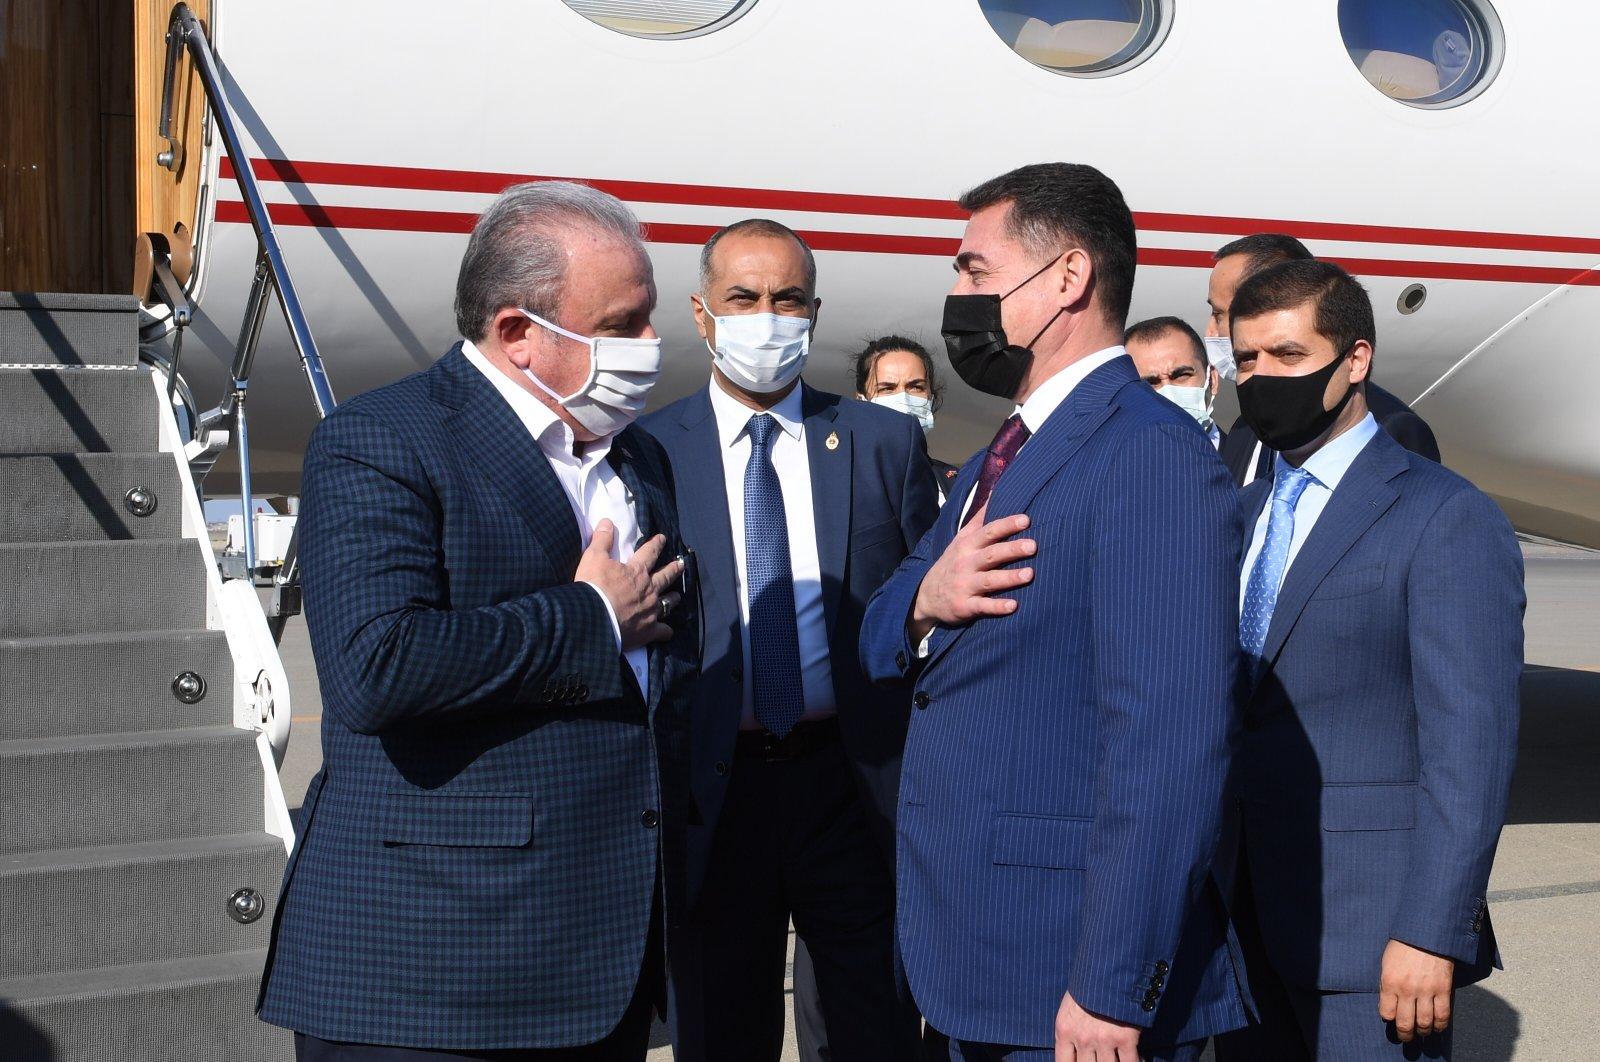 Turkish Parliament Speaker Mustafa Şentop was welcomed by Azerbaijani officials including Deputy Chairman of Baku's Parliament Ali Huseyinli upon his arrival in Azerbaijan on Oct. 18, 2020 (AA Photo)